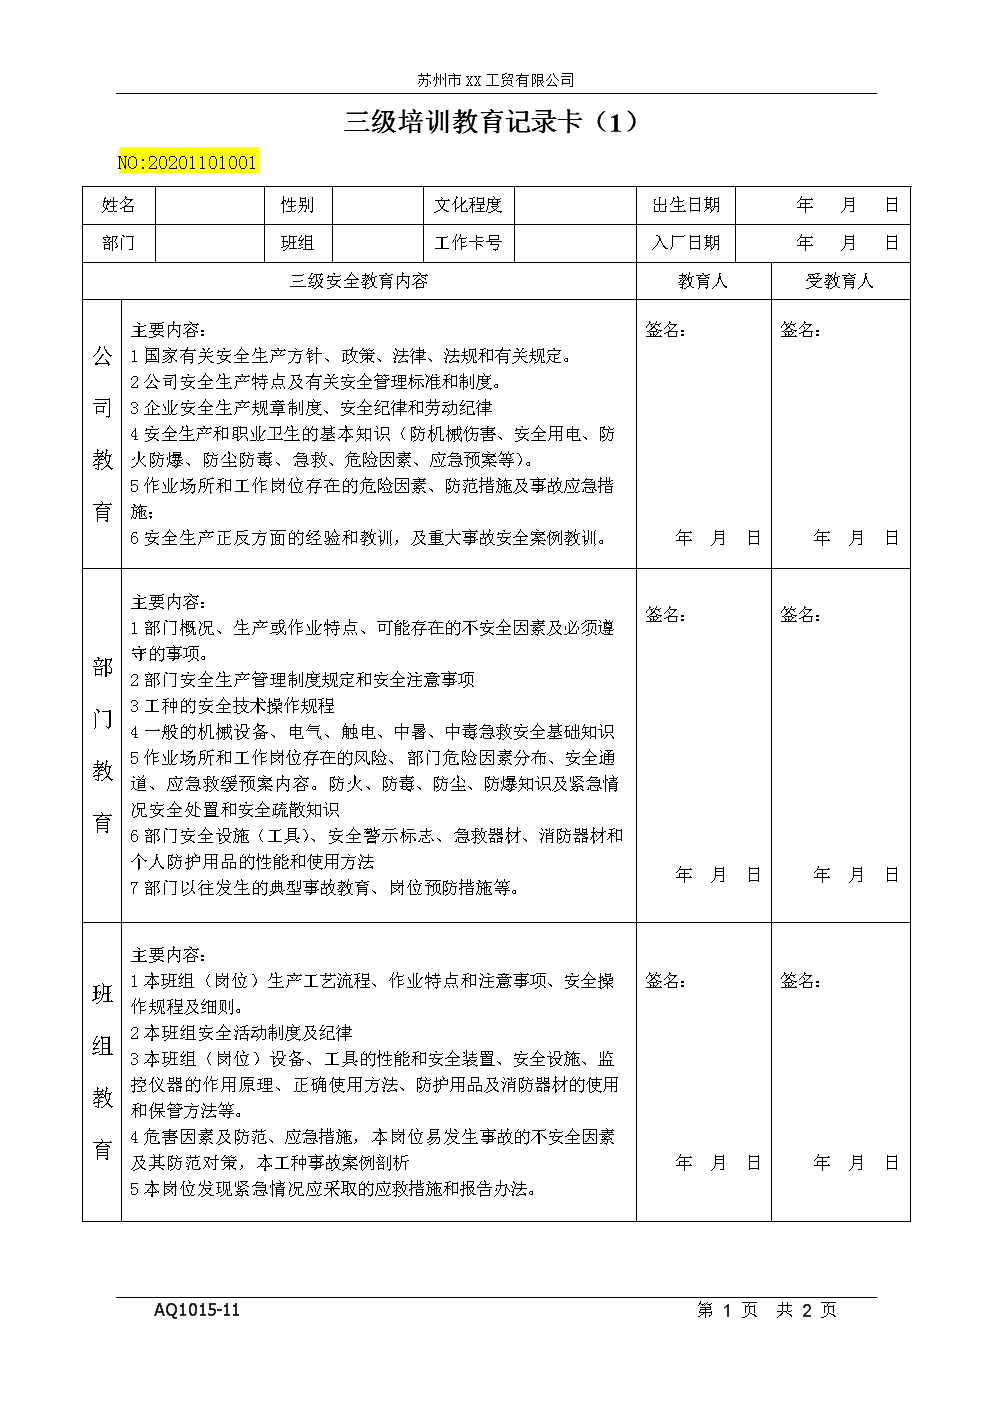 XX工贸有限公司三级培训教育记录卡.doc